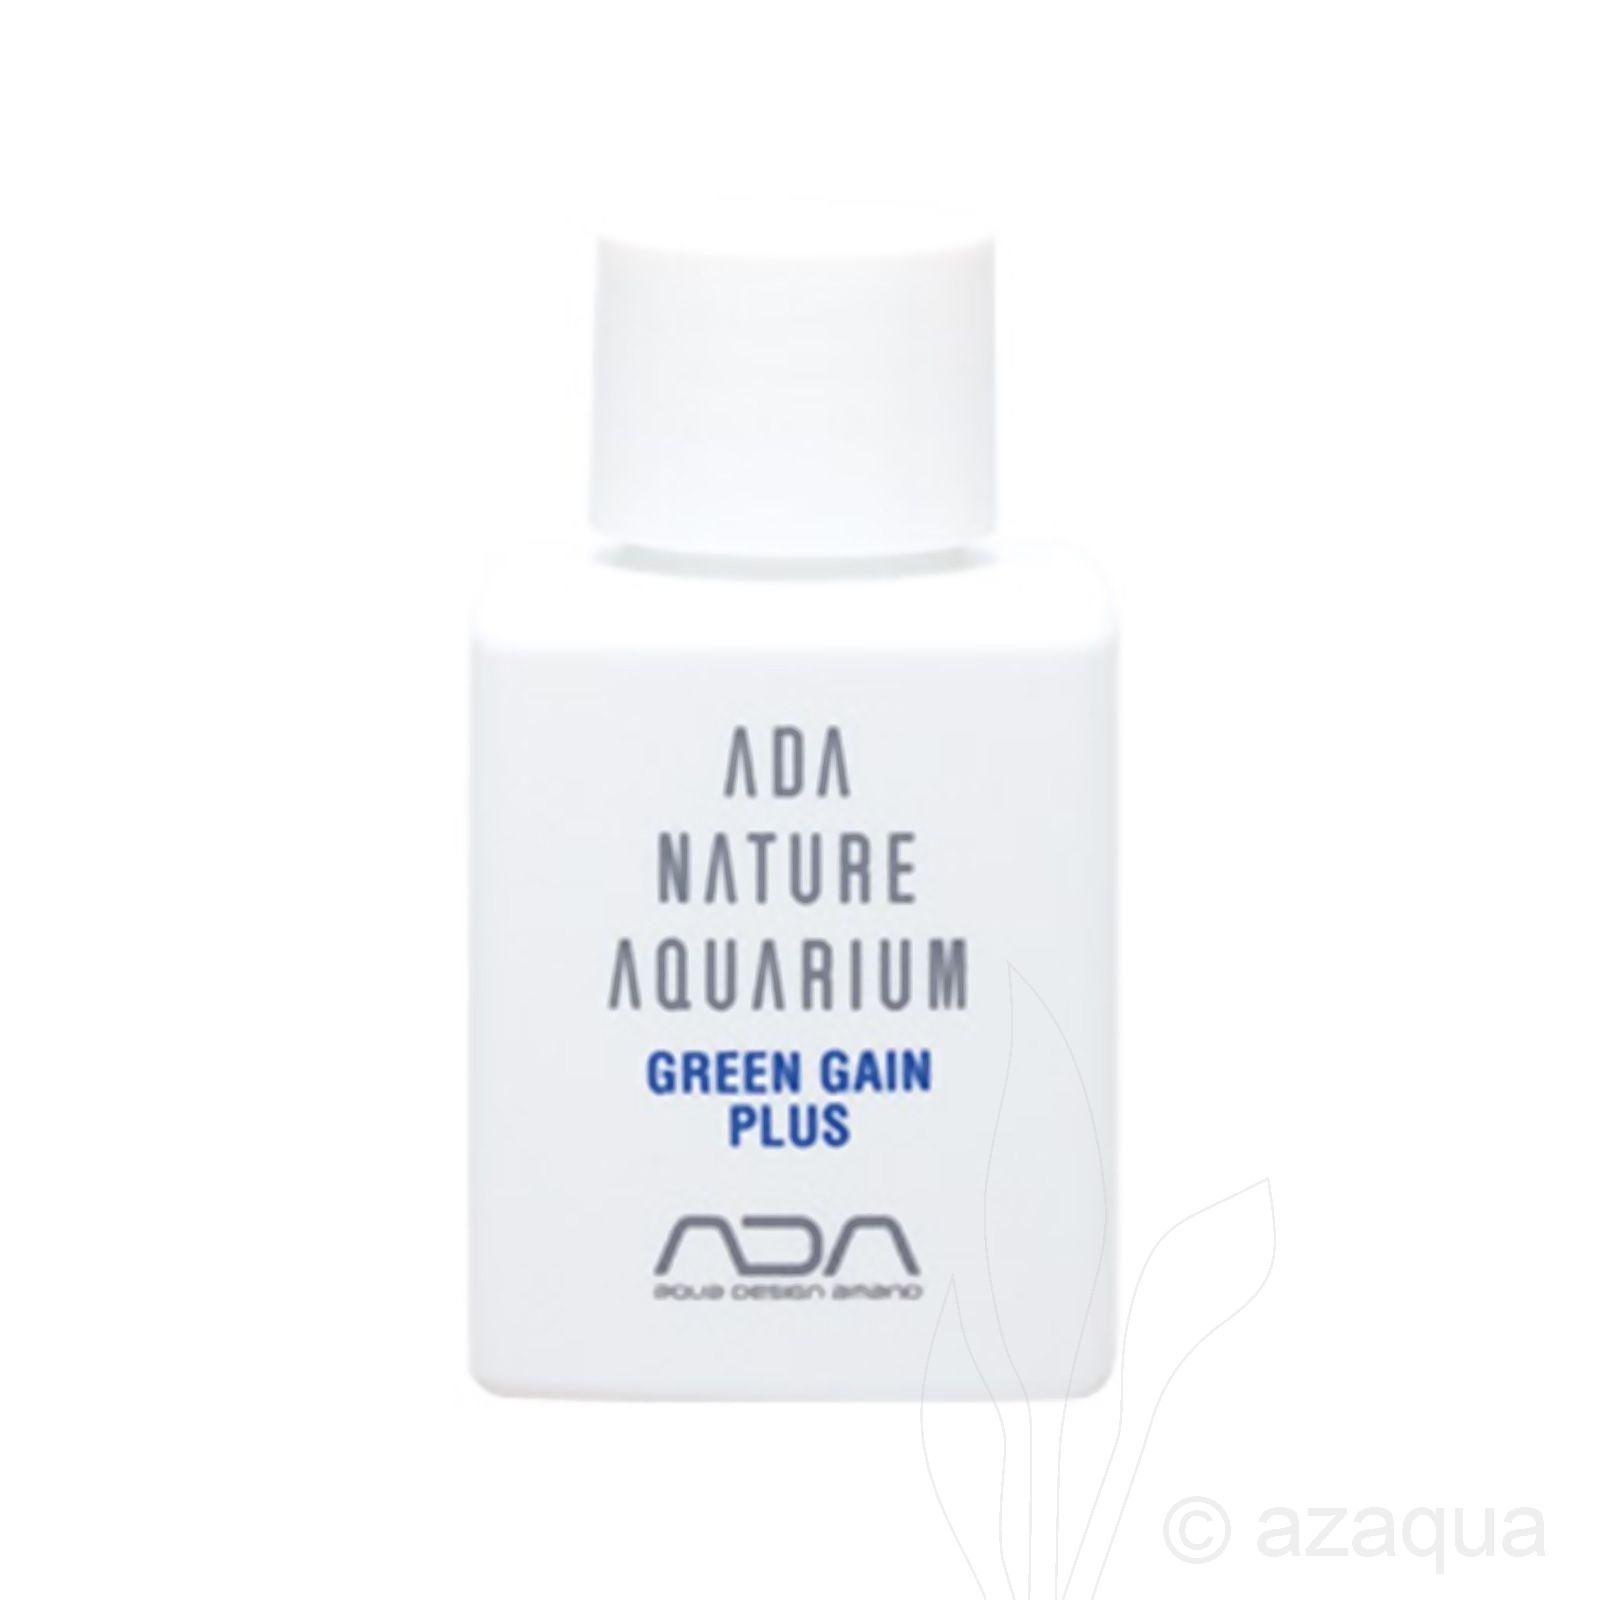 ADA Green Gain Plus